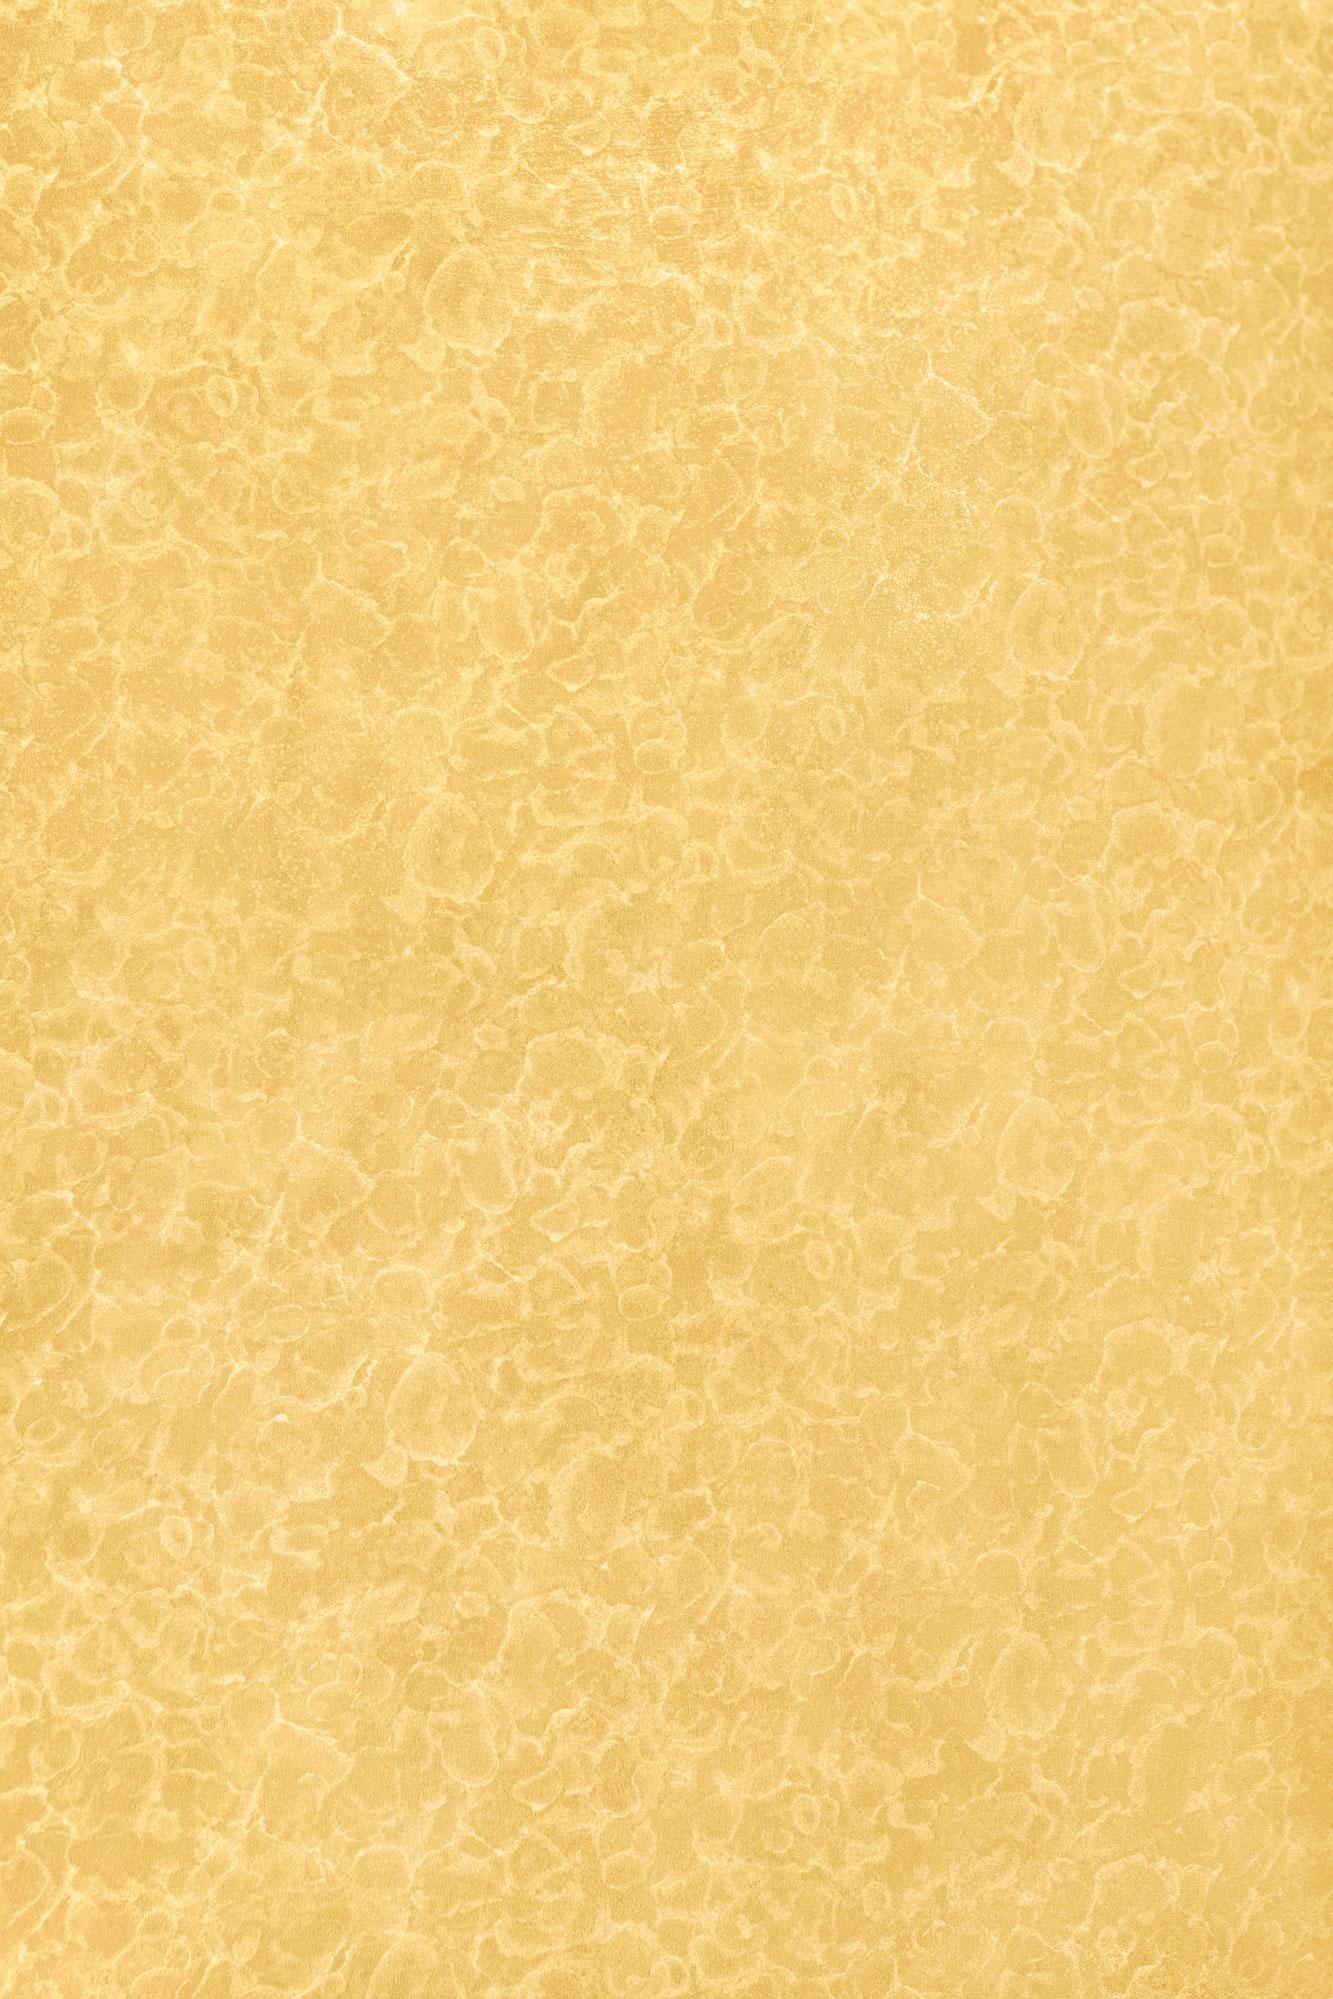 1705 HG Жёлтая фантазия